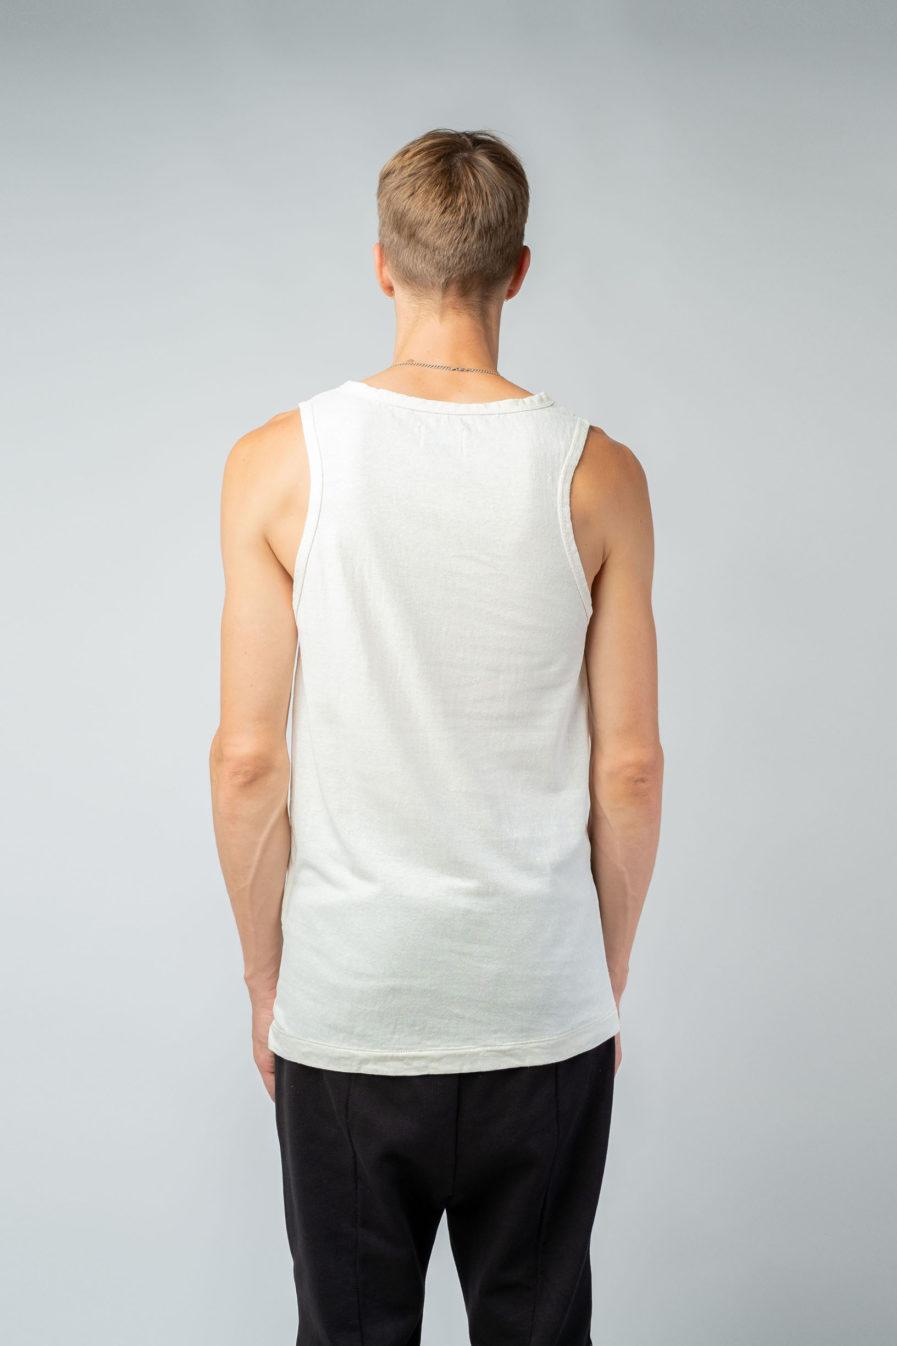 MAN unisex singlet tanktop hemp organic cotton SONNY Blank canvas back